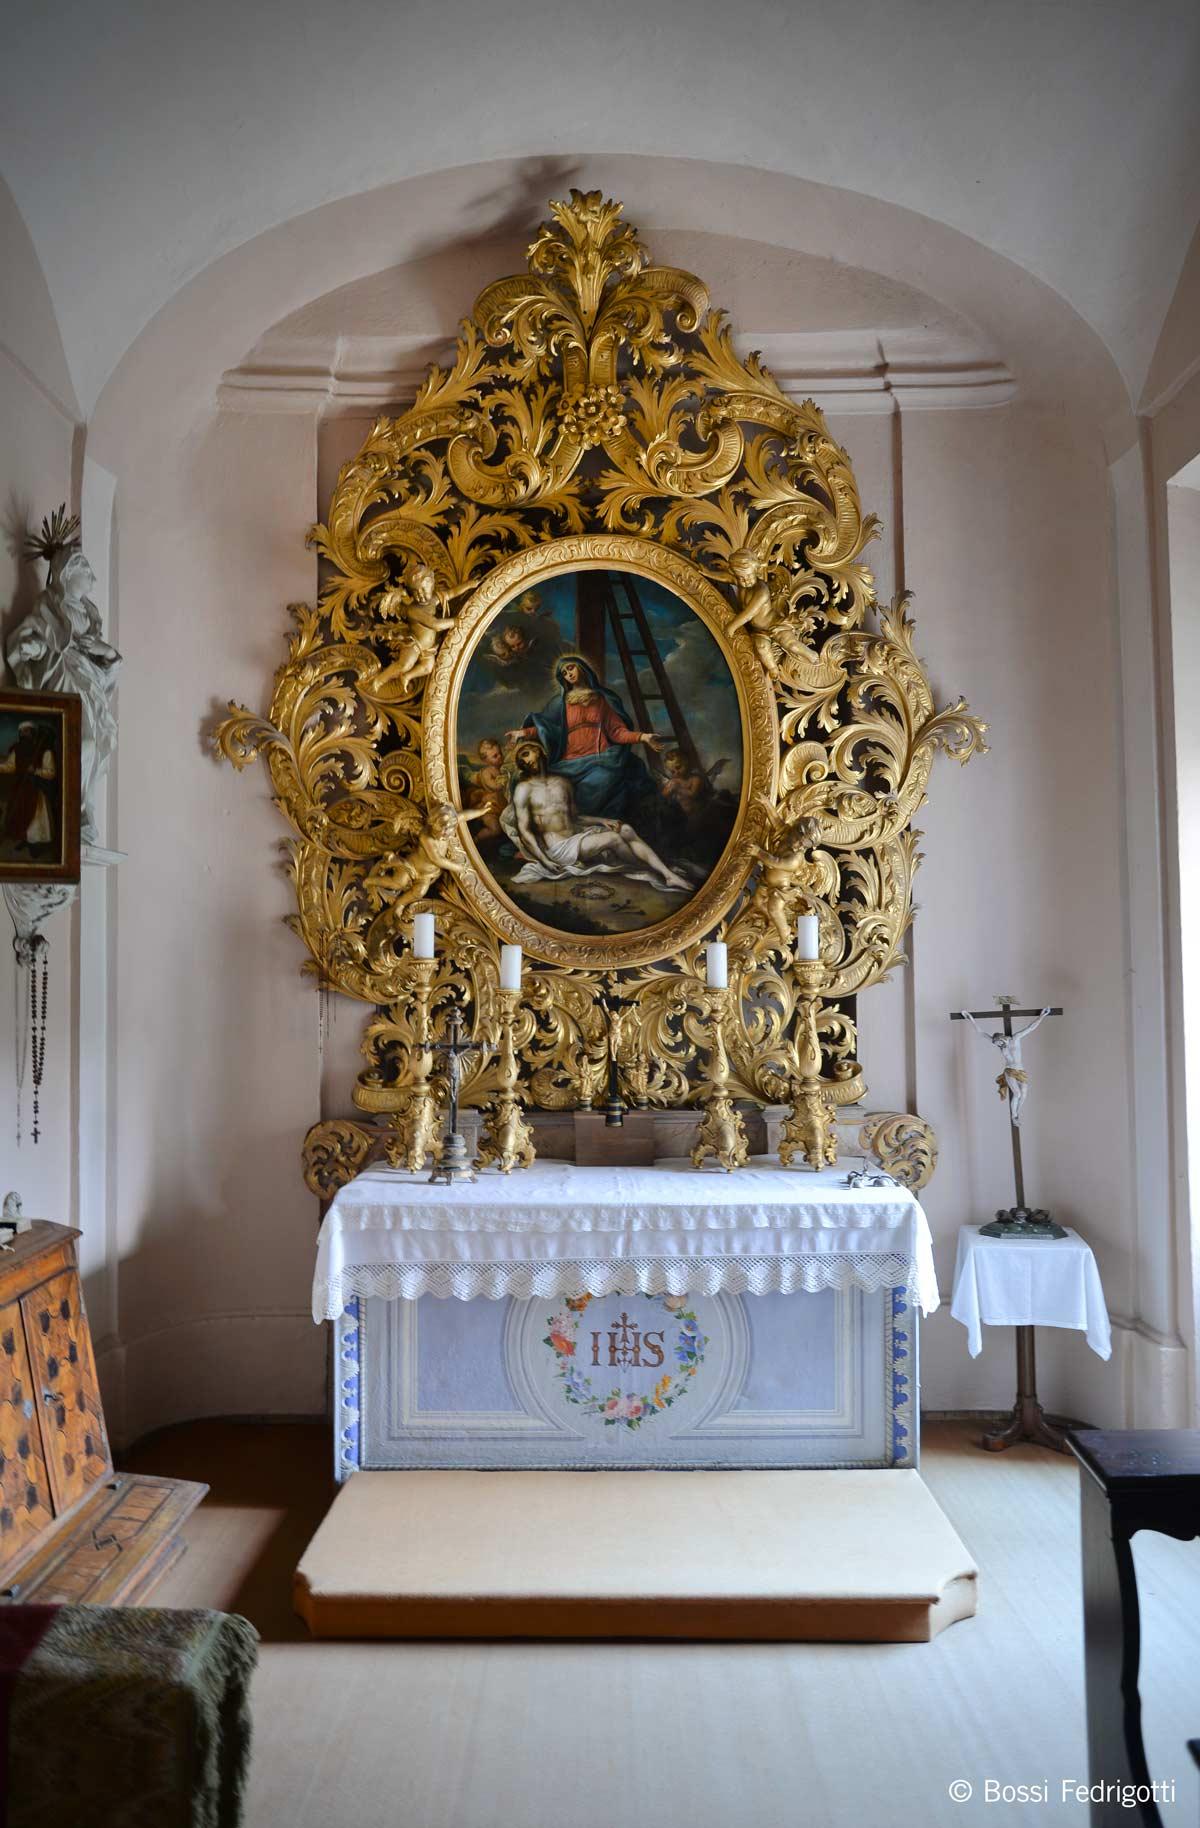 Schloss-Weinern_121_Bossi-Fedrigotti.jpg